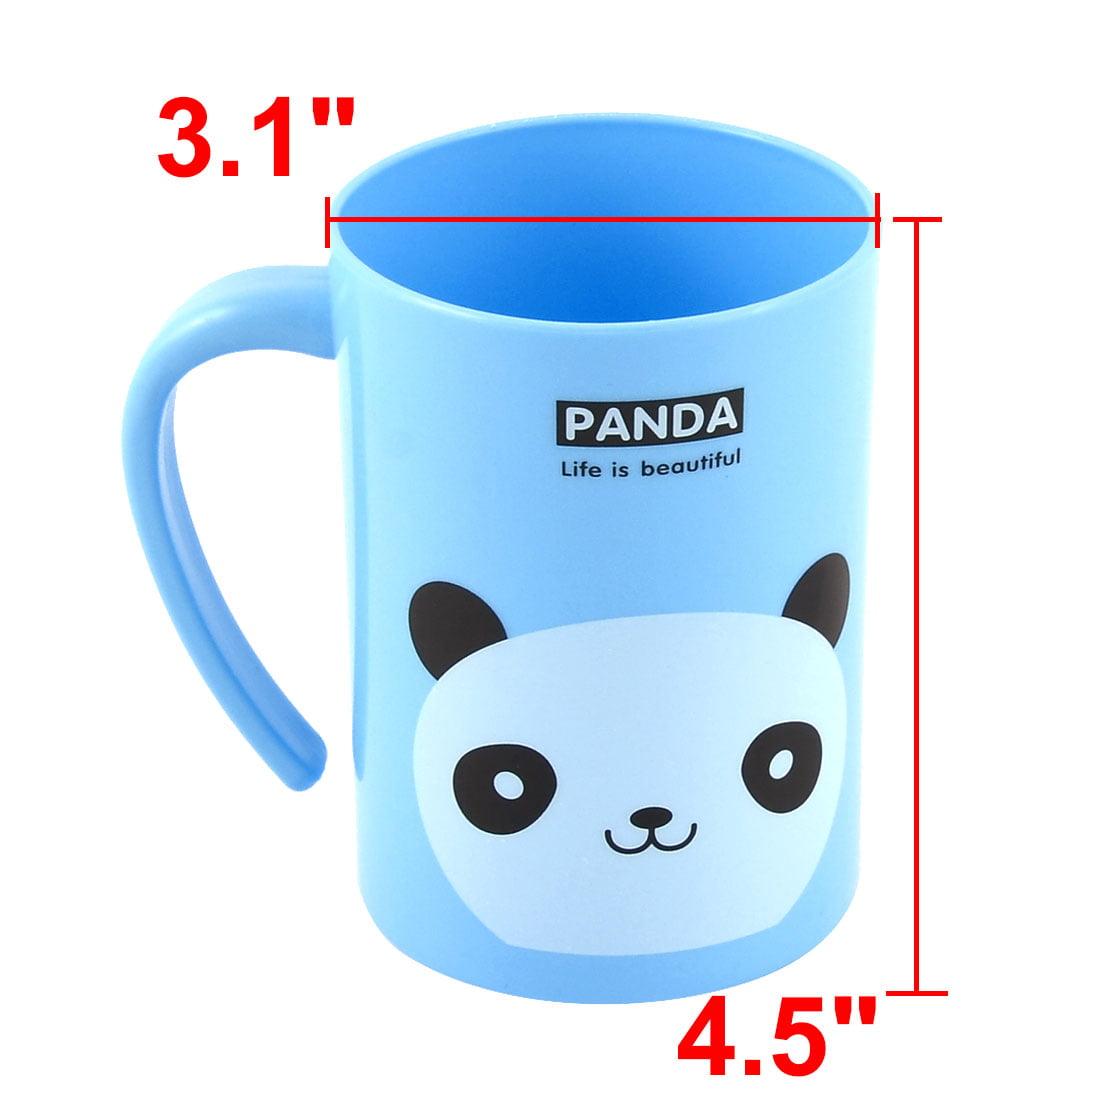 Uxcell Plastic Cartoon Panda Pattern Toothbrush Holder